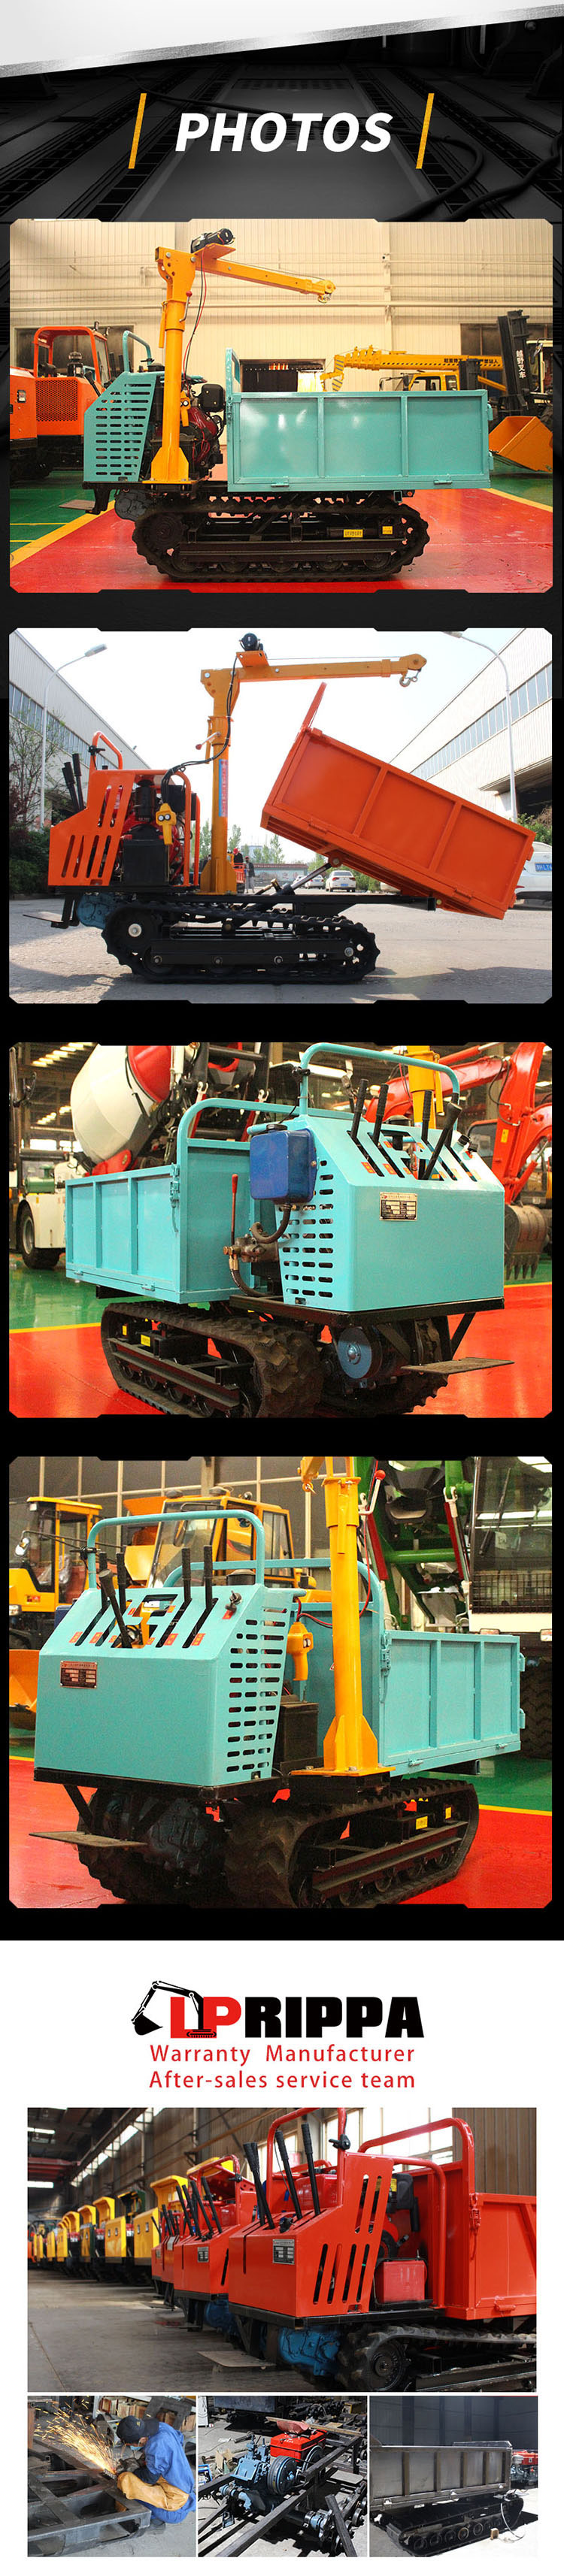 1.2 ton crawler truck-Rippa China